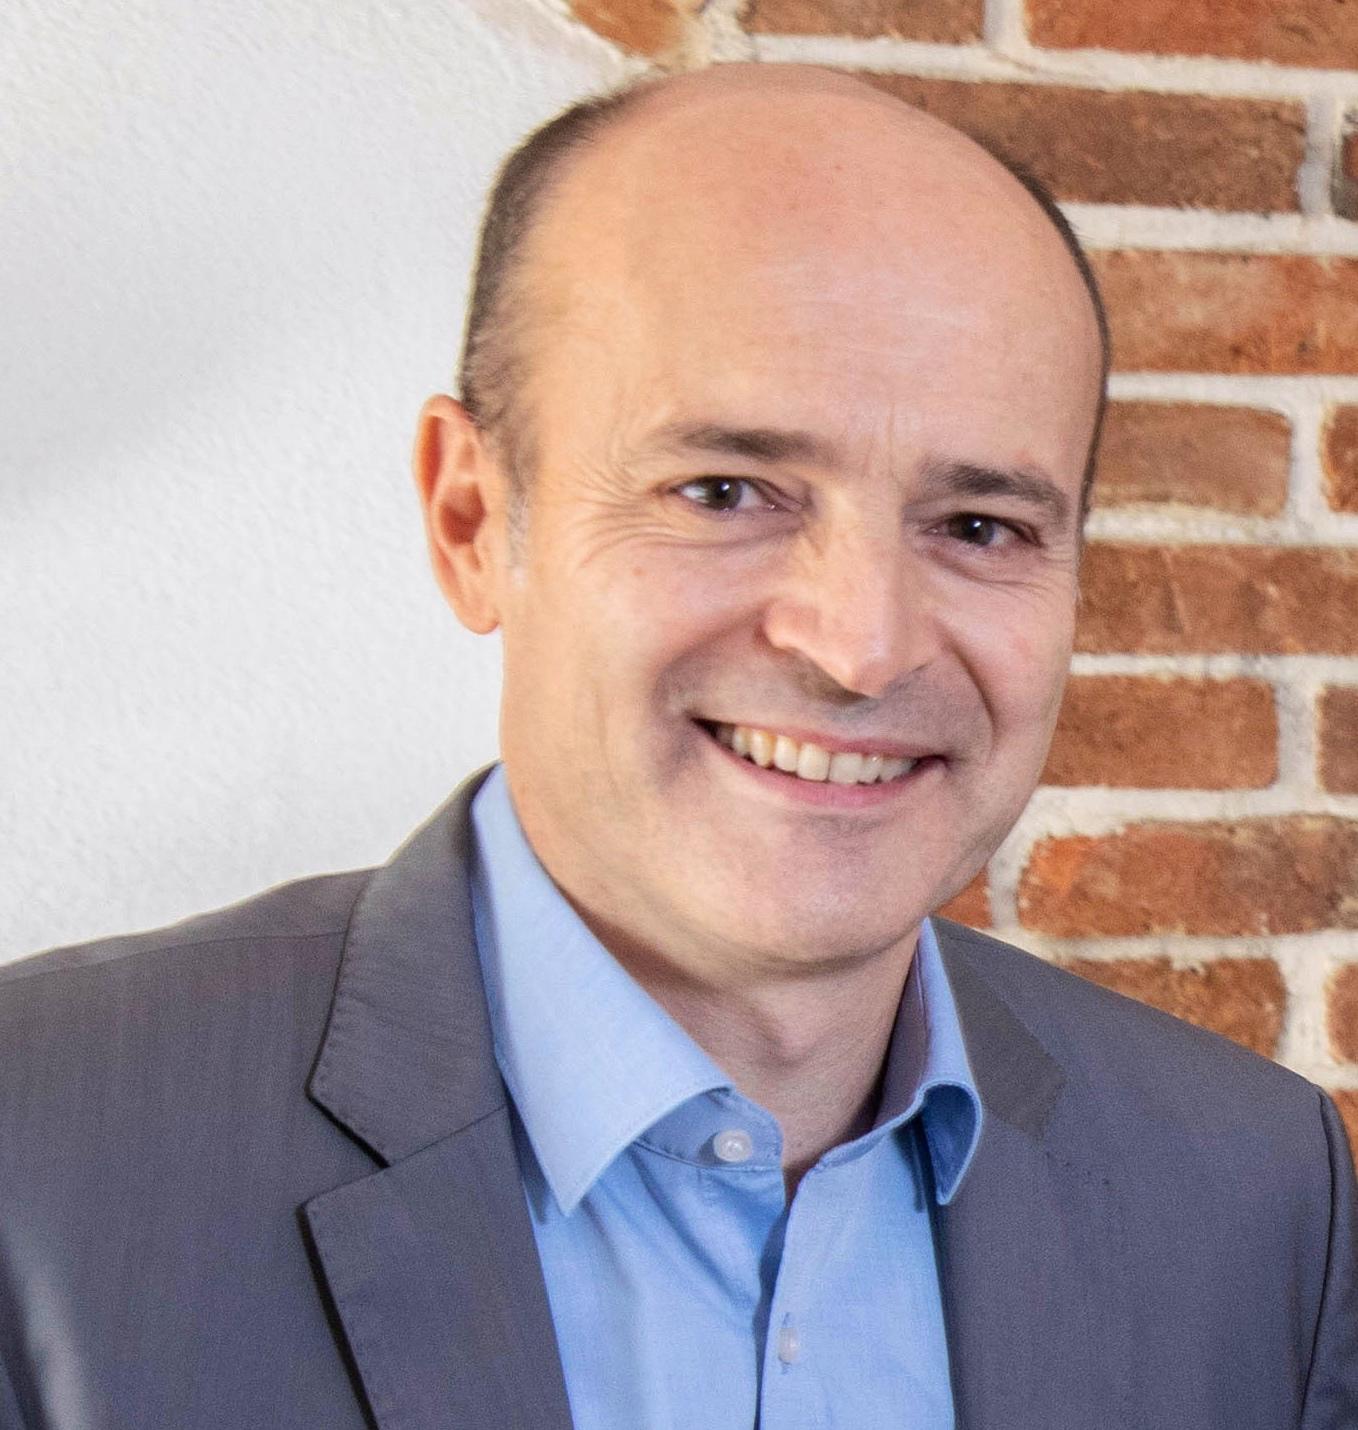 Dr. Clemens Klingan